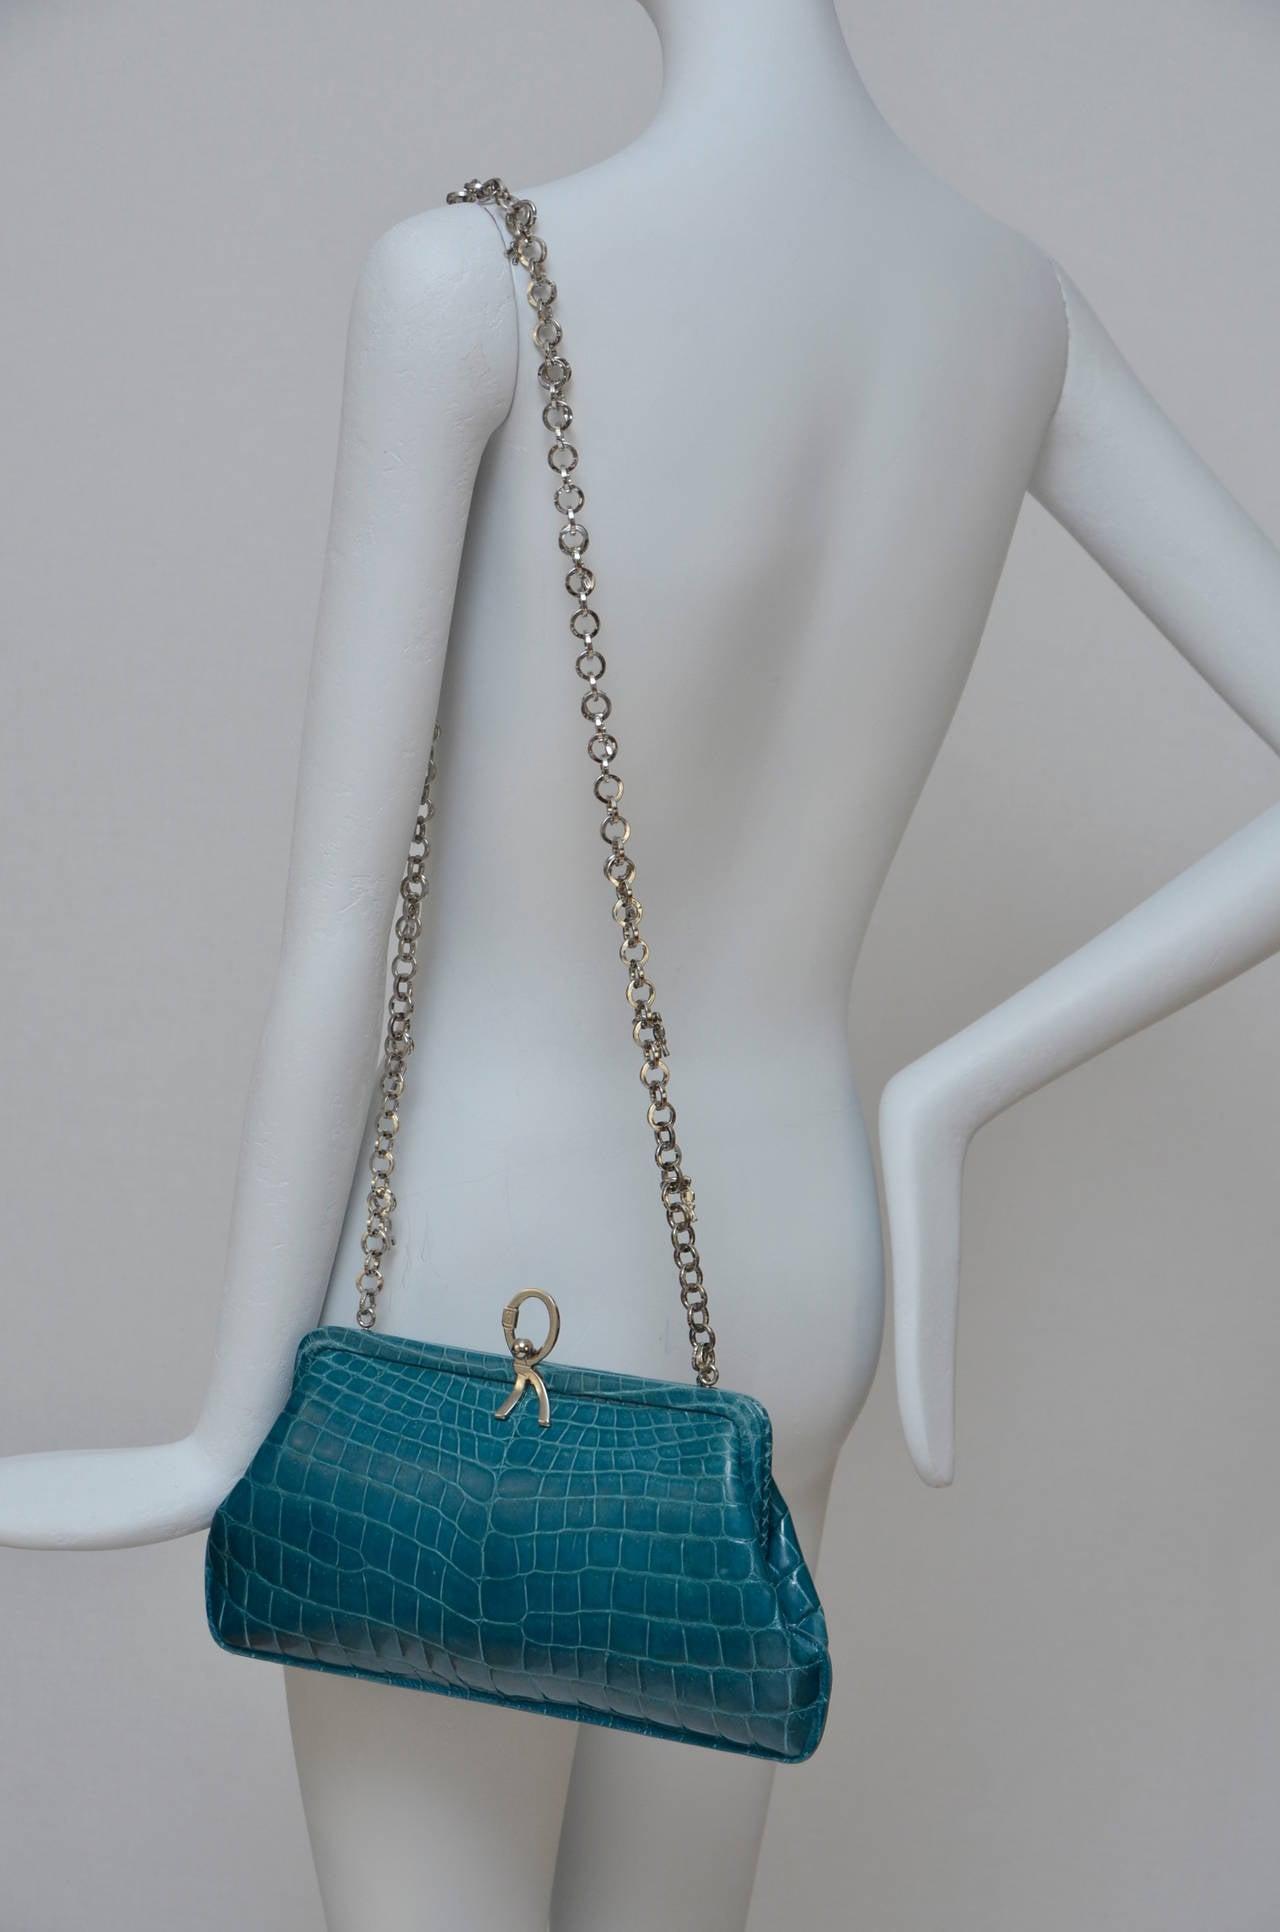 ROBERTA DI CAMERINO Crocodile Clutch Handbag Mint 9